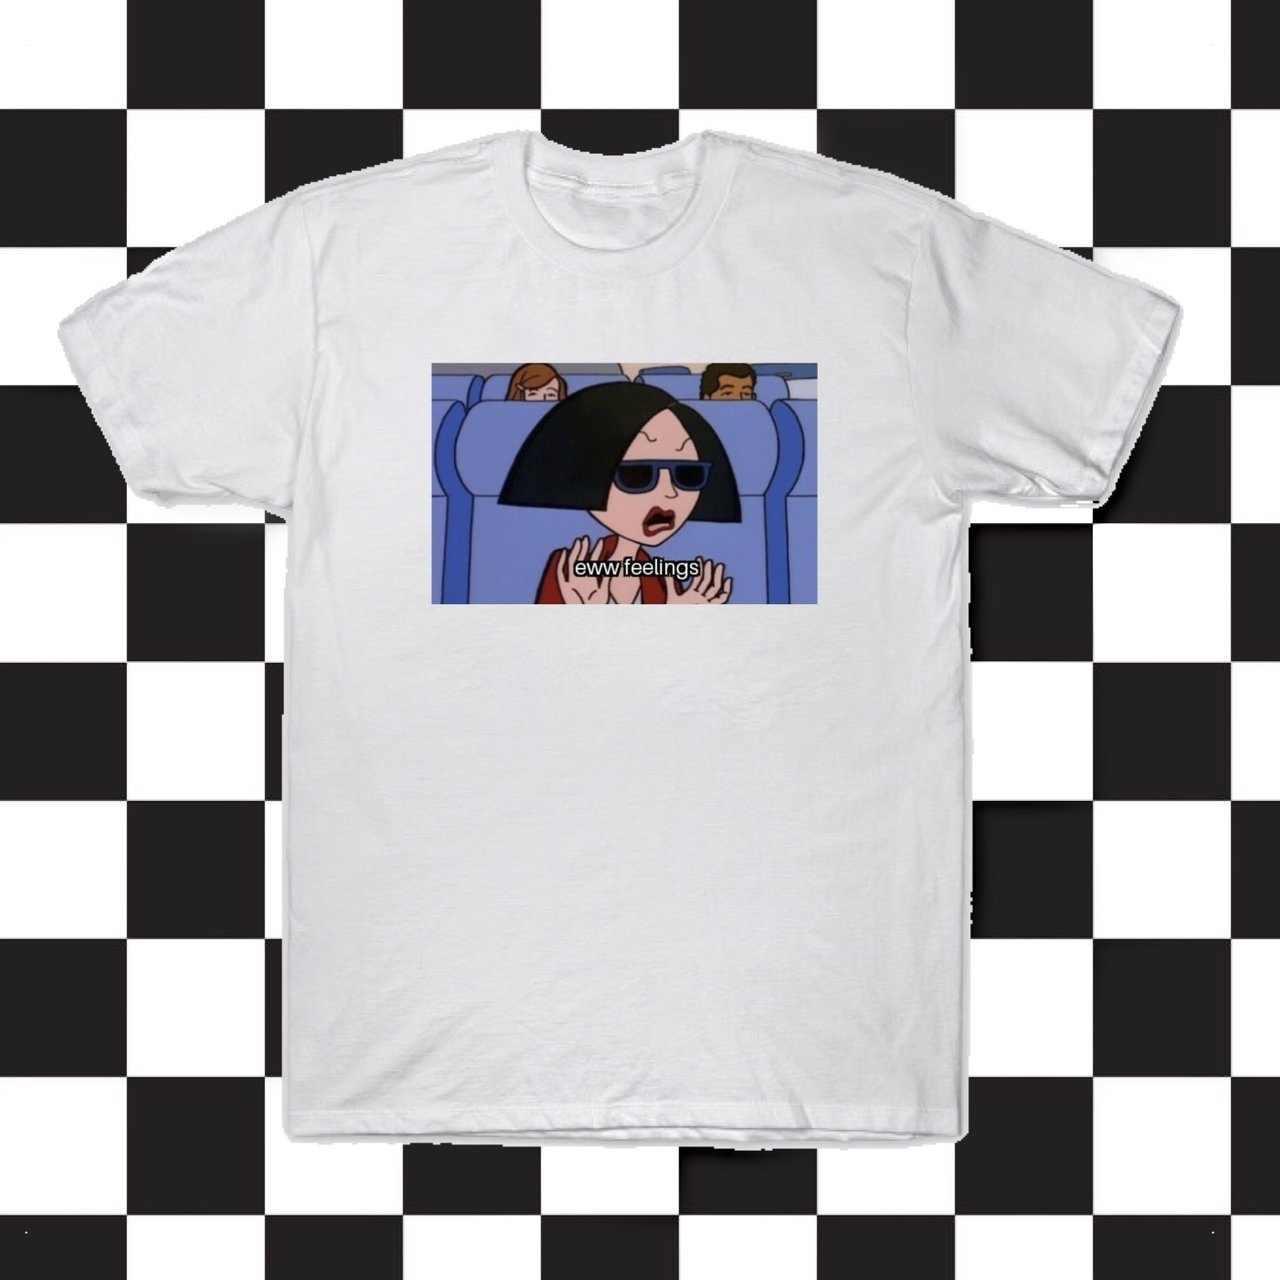 cb9b9499f ... kuakuayu HJN Unisex Eww Feelings 90s Vintage Fashion T-Shirt Grunge  Aesthetic White Tee Daria ...